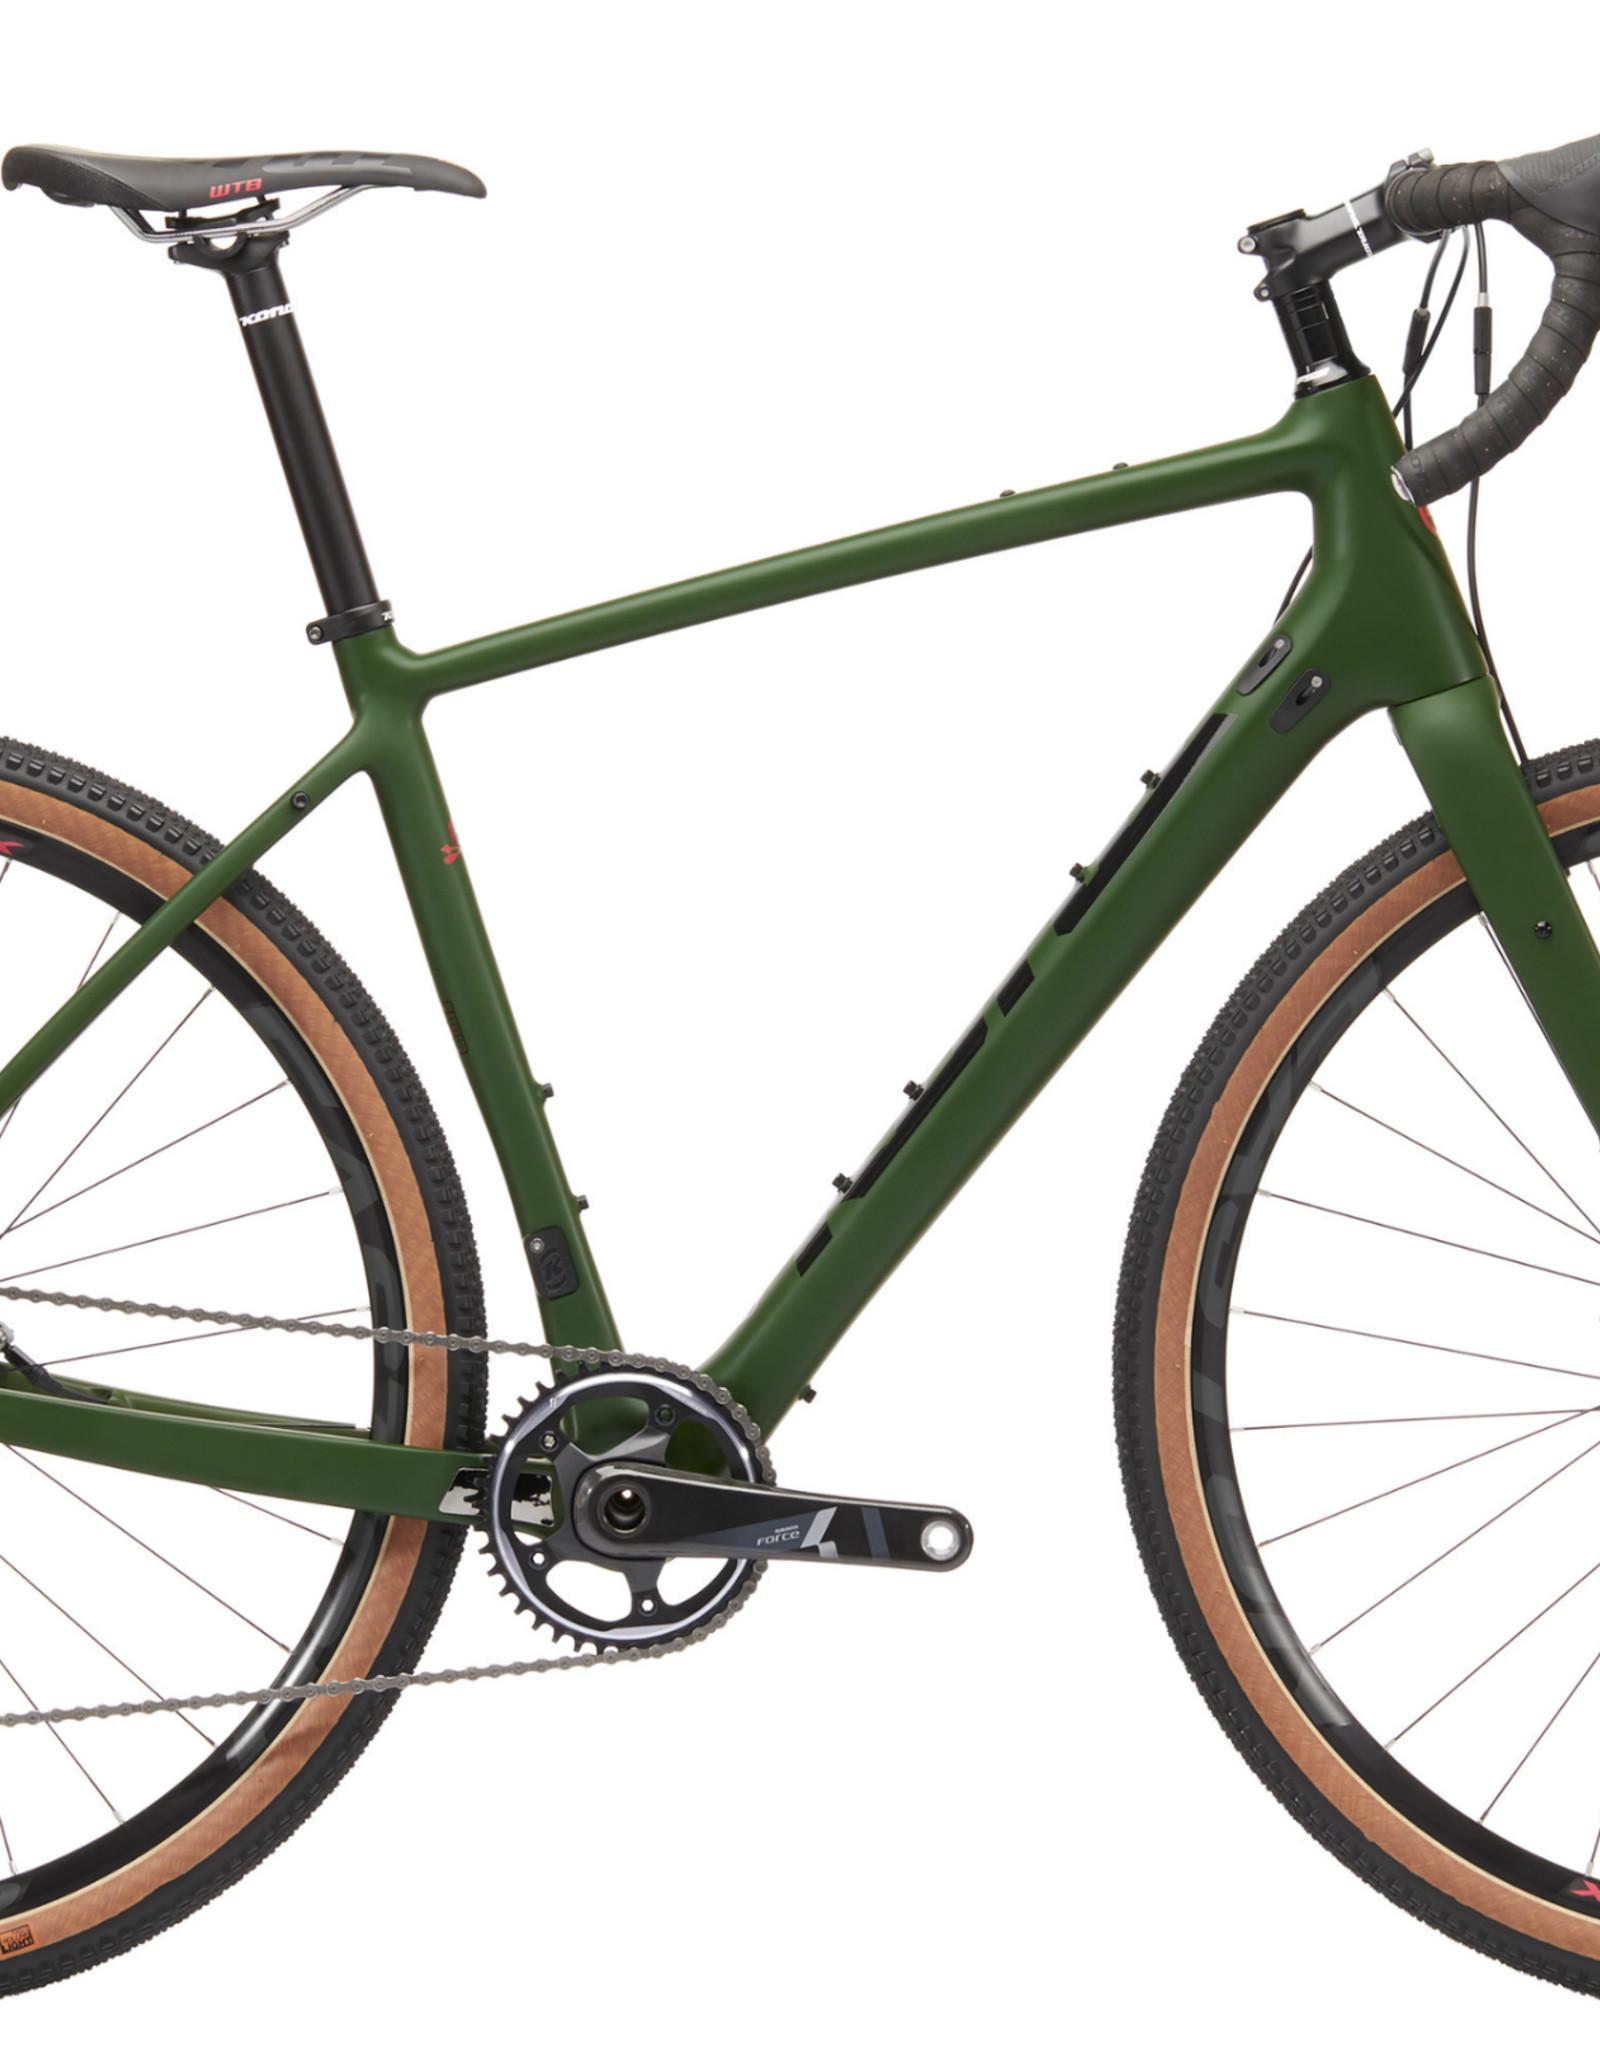 Kona Bicycles Libre DL 58cm FRAMESET ONLY w/ Kona Verso Full Carbon Flat Mount Disc Fork, 12mm F/R Axle